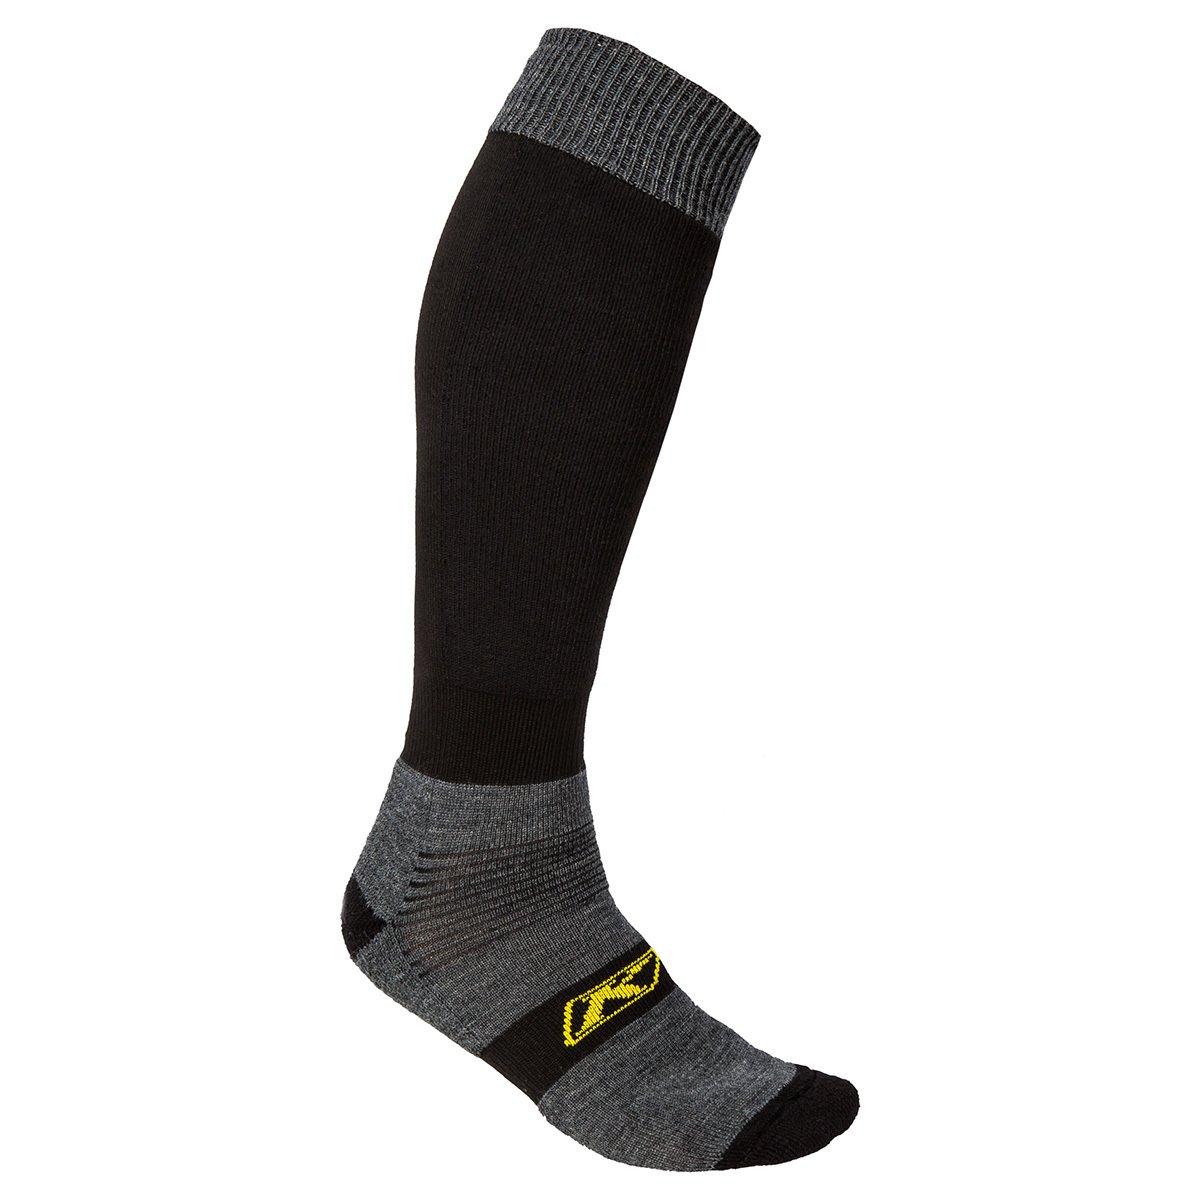 Klim Sock - Black/Large